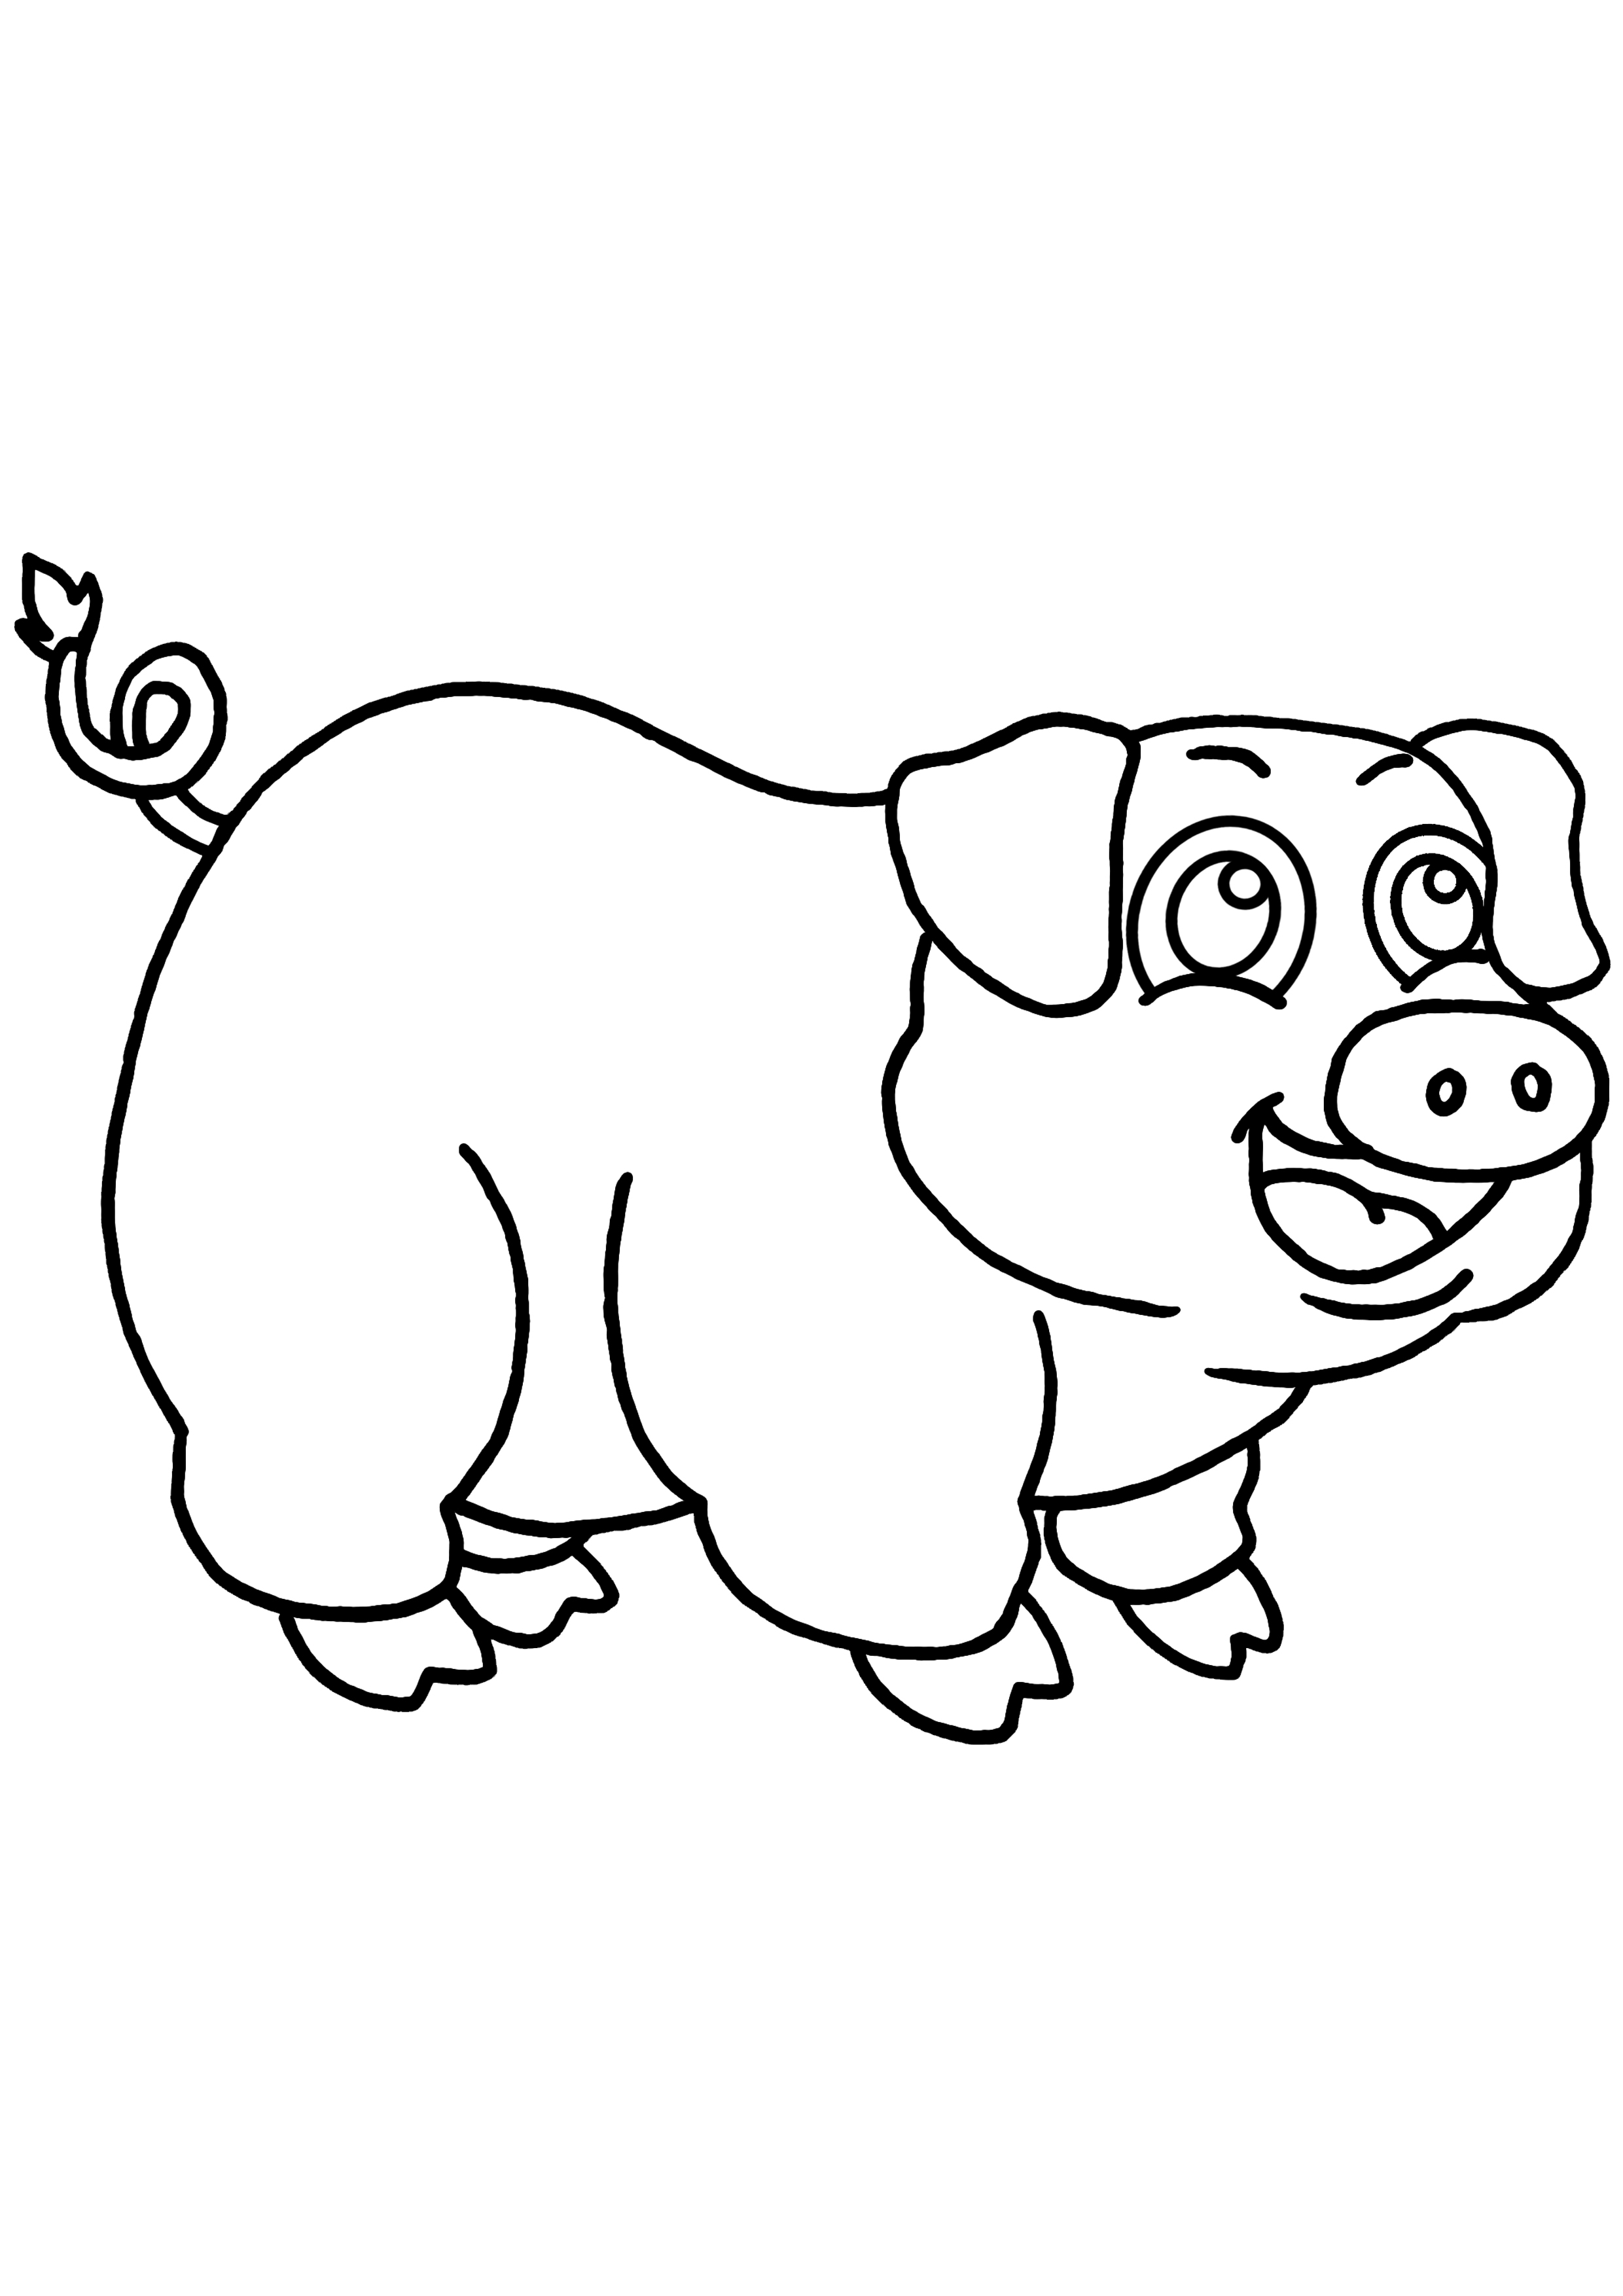 coloriage de cochon la image coloriage de cochon dinde a auto20 dessins de coloriage cochon en ligne u00e0 imprimer